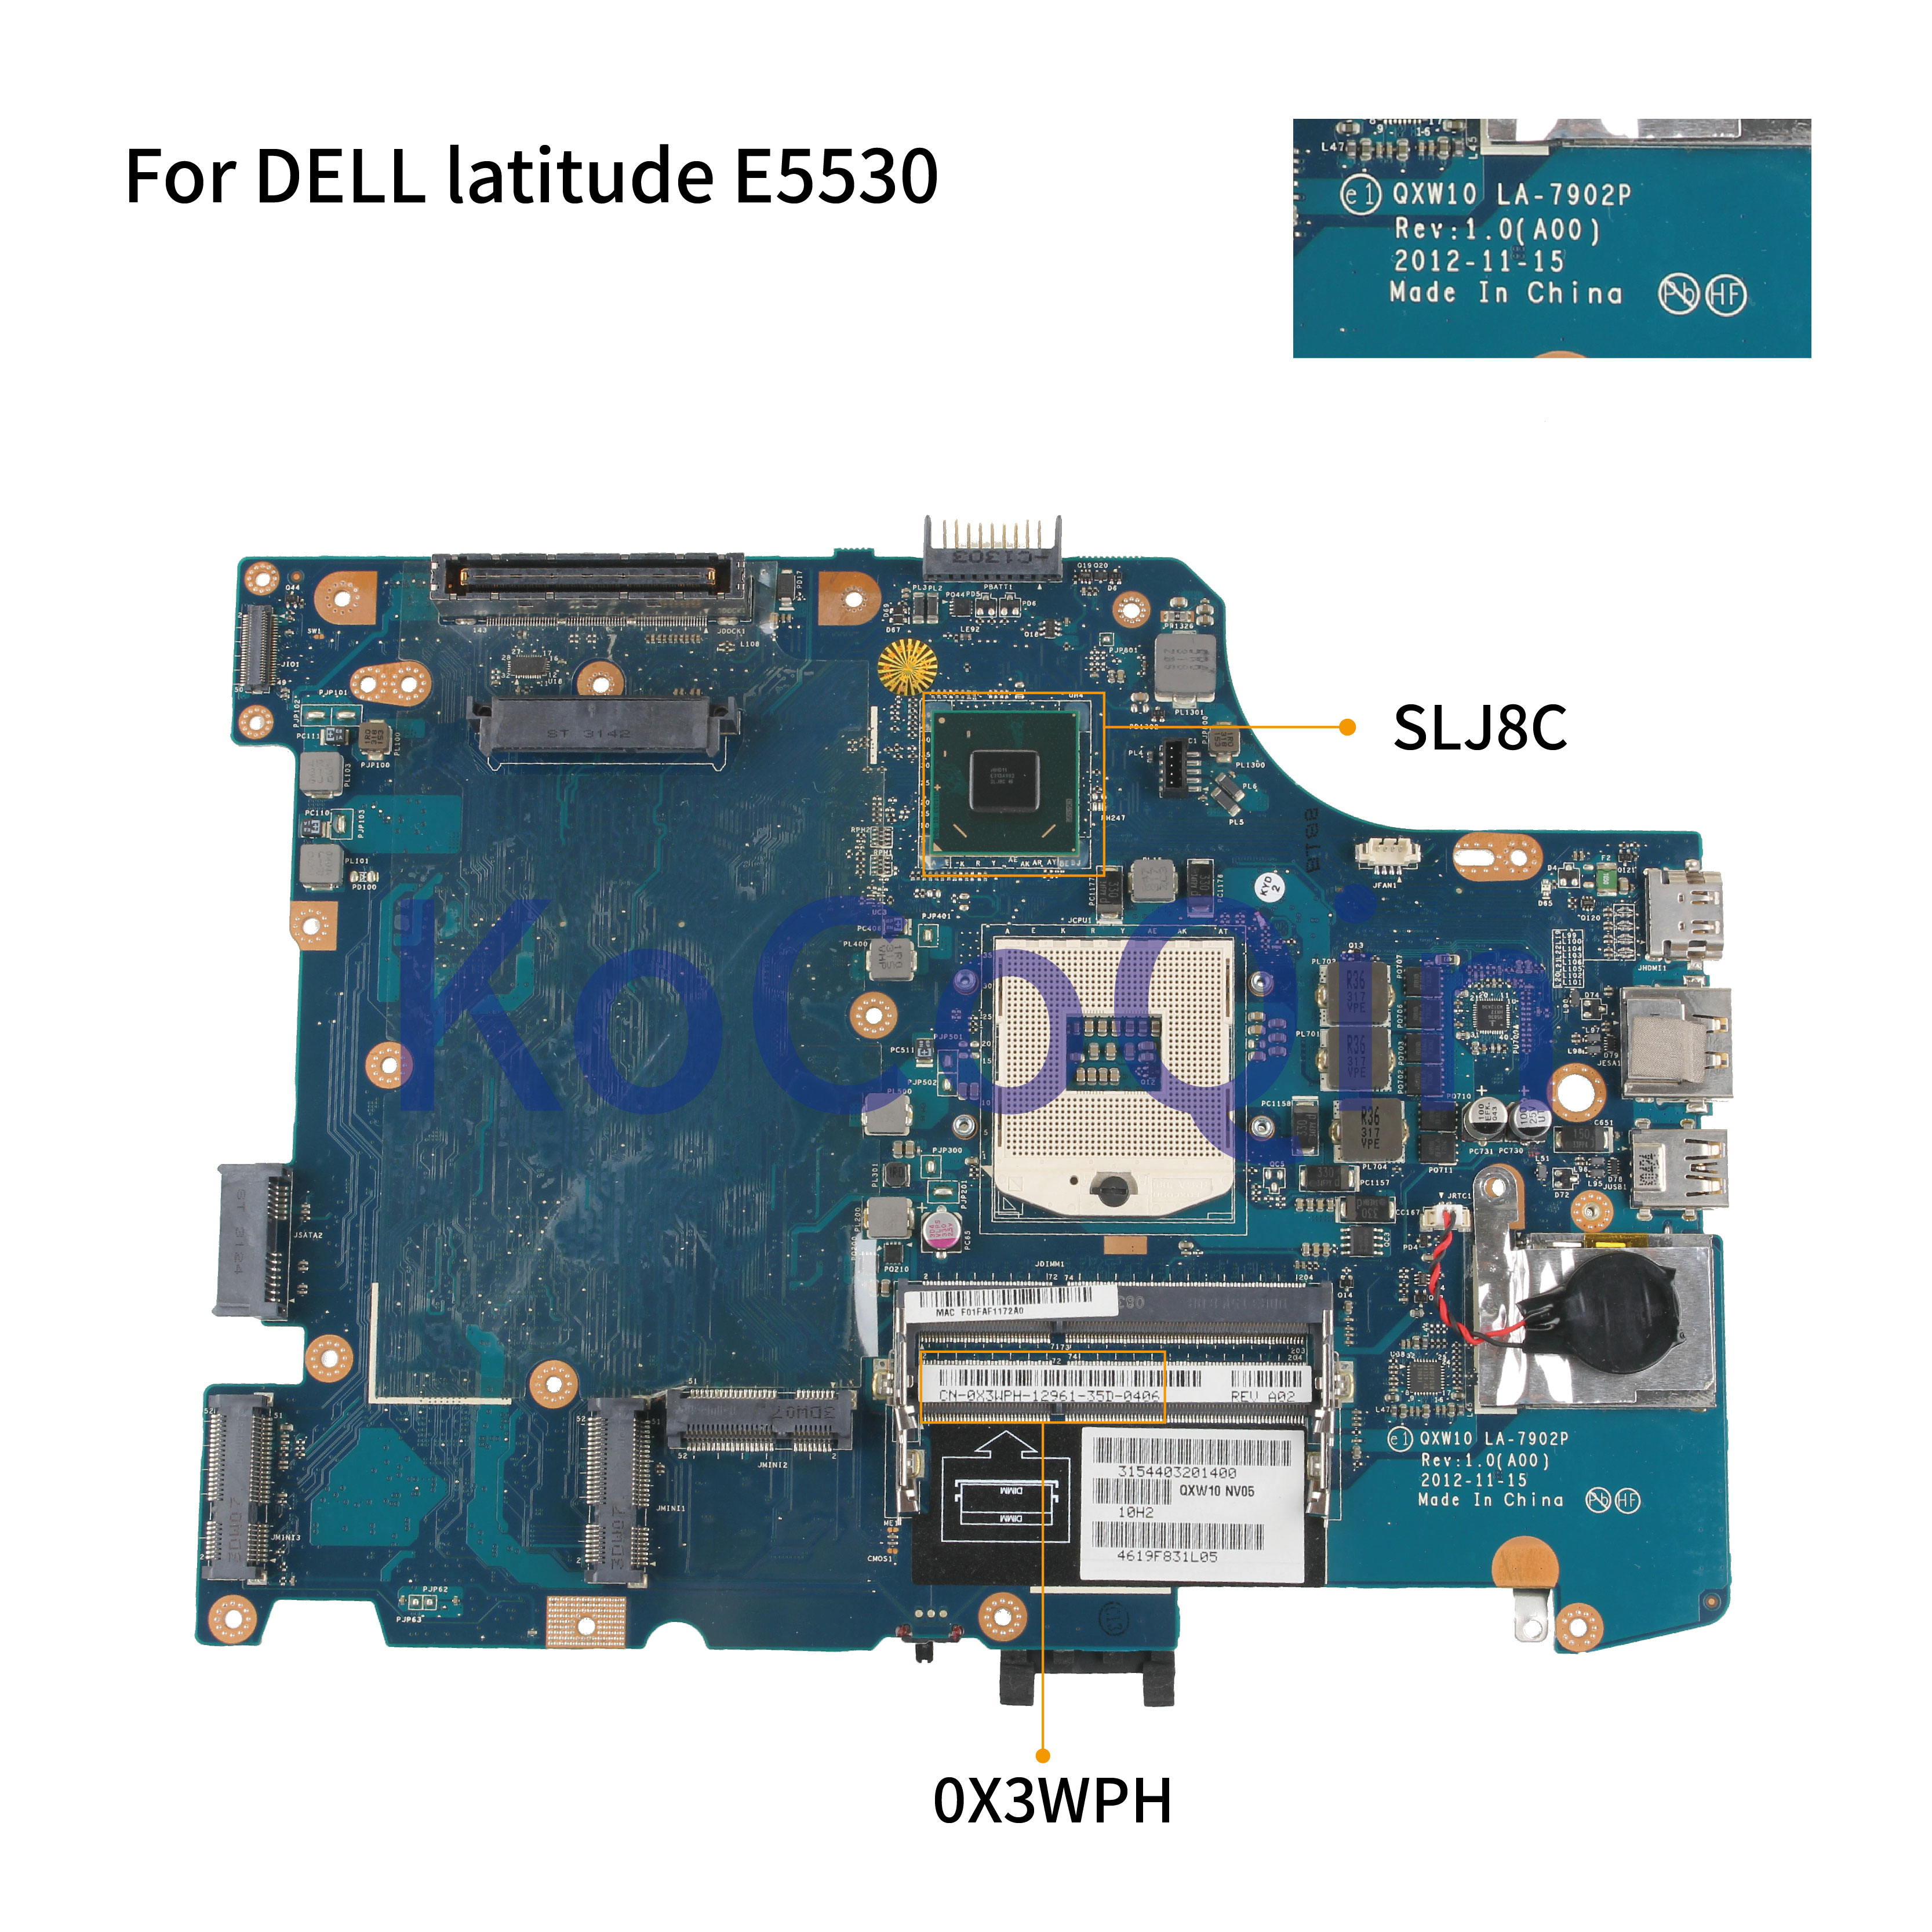 KoCoQin Laptop Mainboard For DELL Latitude 5530 E5530 QXW10 LA-7902P CN-0X3WPH 0X3WPH SLJ8C MOTHERBOARD